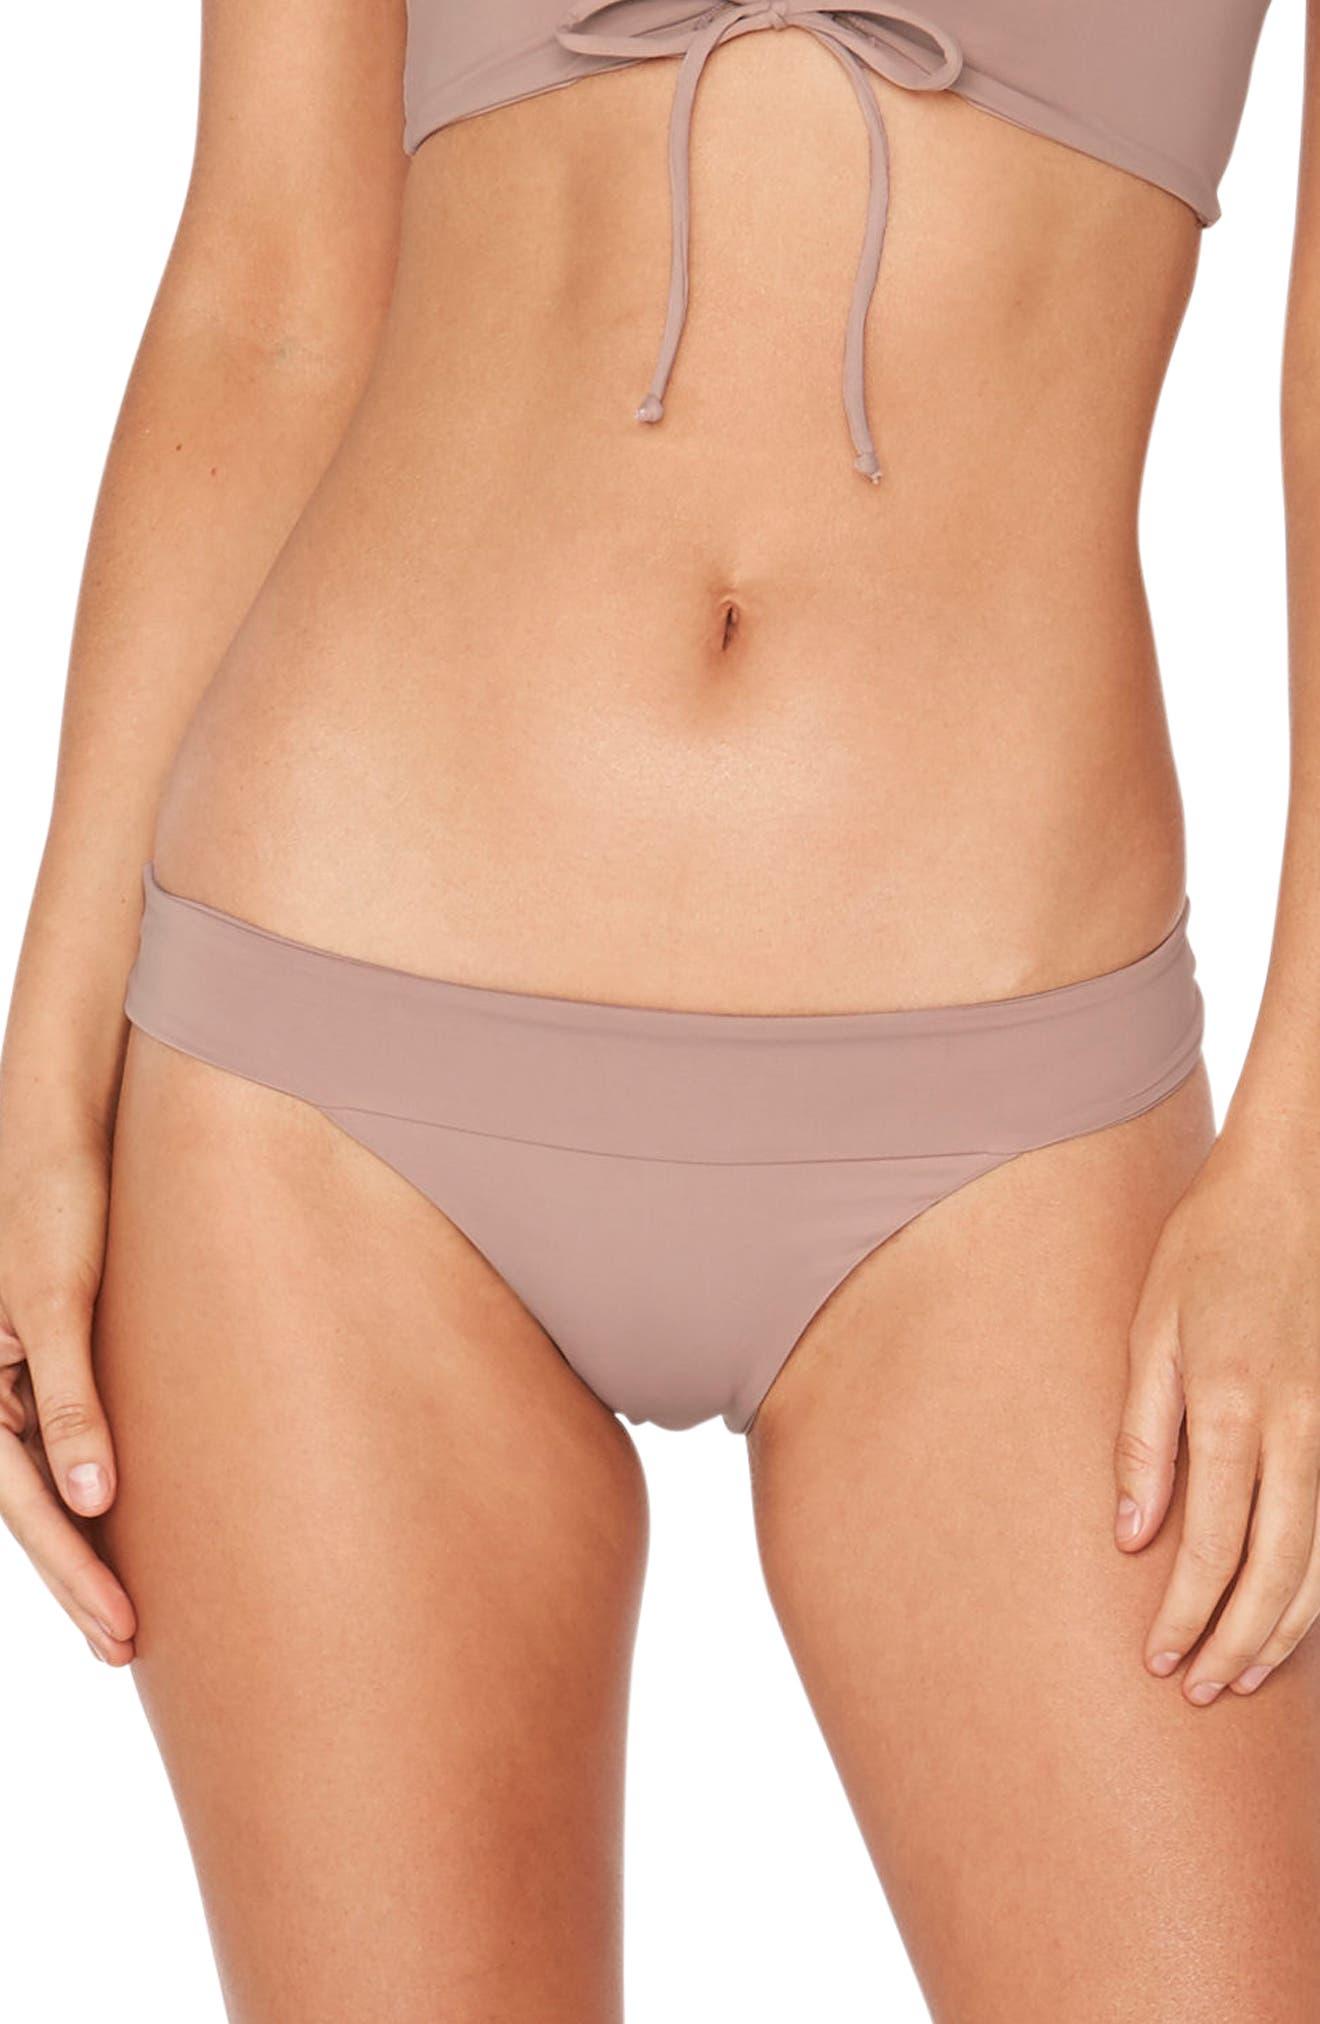 Veronica Classic Bikini Bottoms,                             Main thumbnail 1, color,                             Dusty Pearl